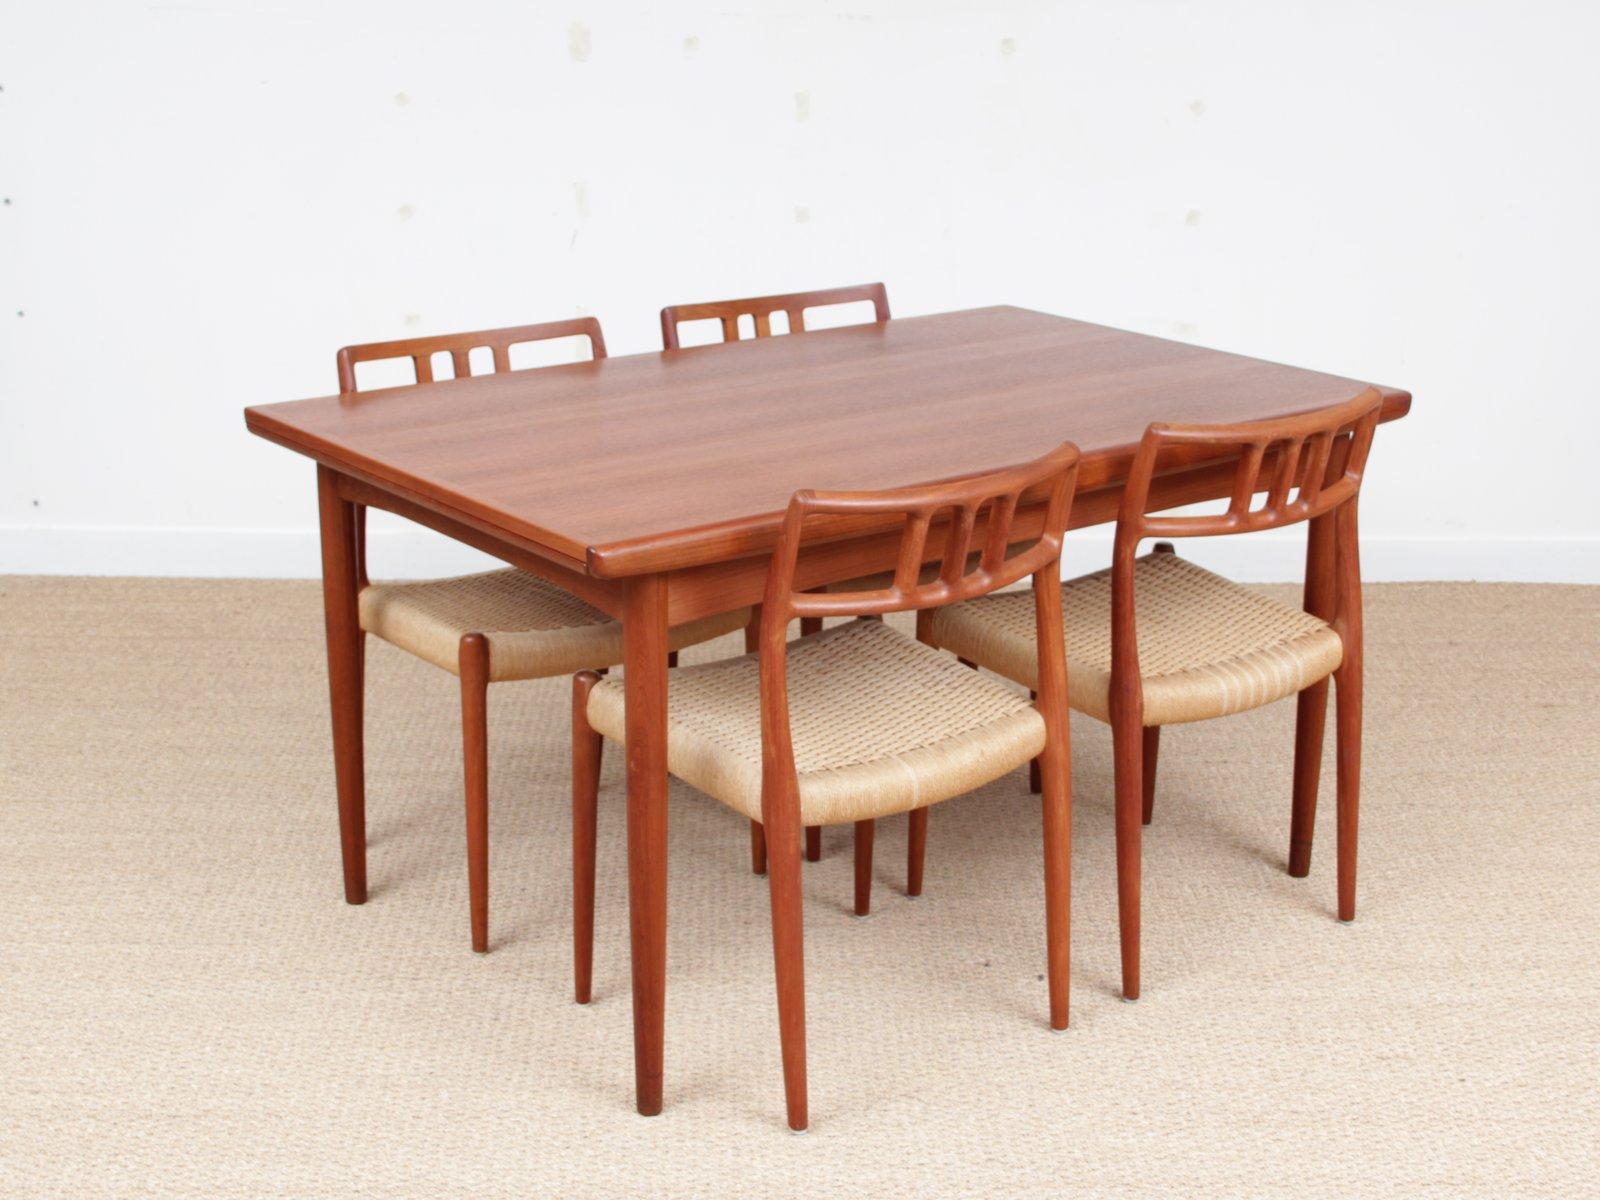 Scandinavian Teak Dining Table from Dyrlund 1950s for  : scandinavian teak dining table from dyrlund 1950s 12 from www.pamono.co.uk size 1601 x 1200 jpeg 146kB